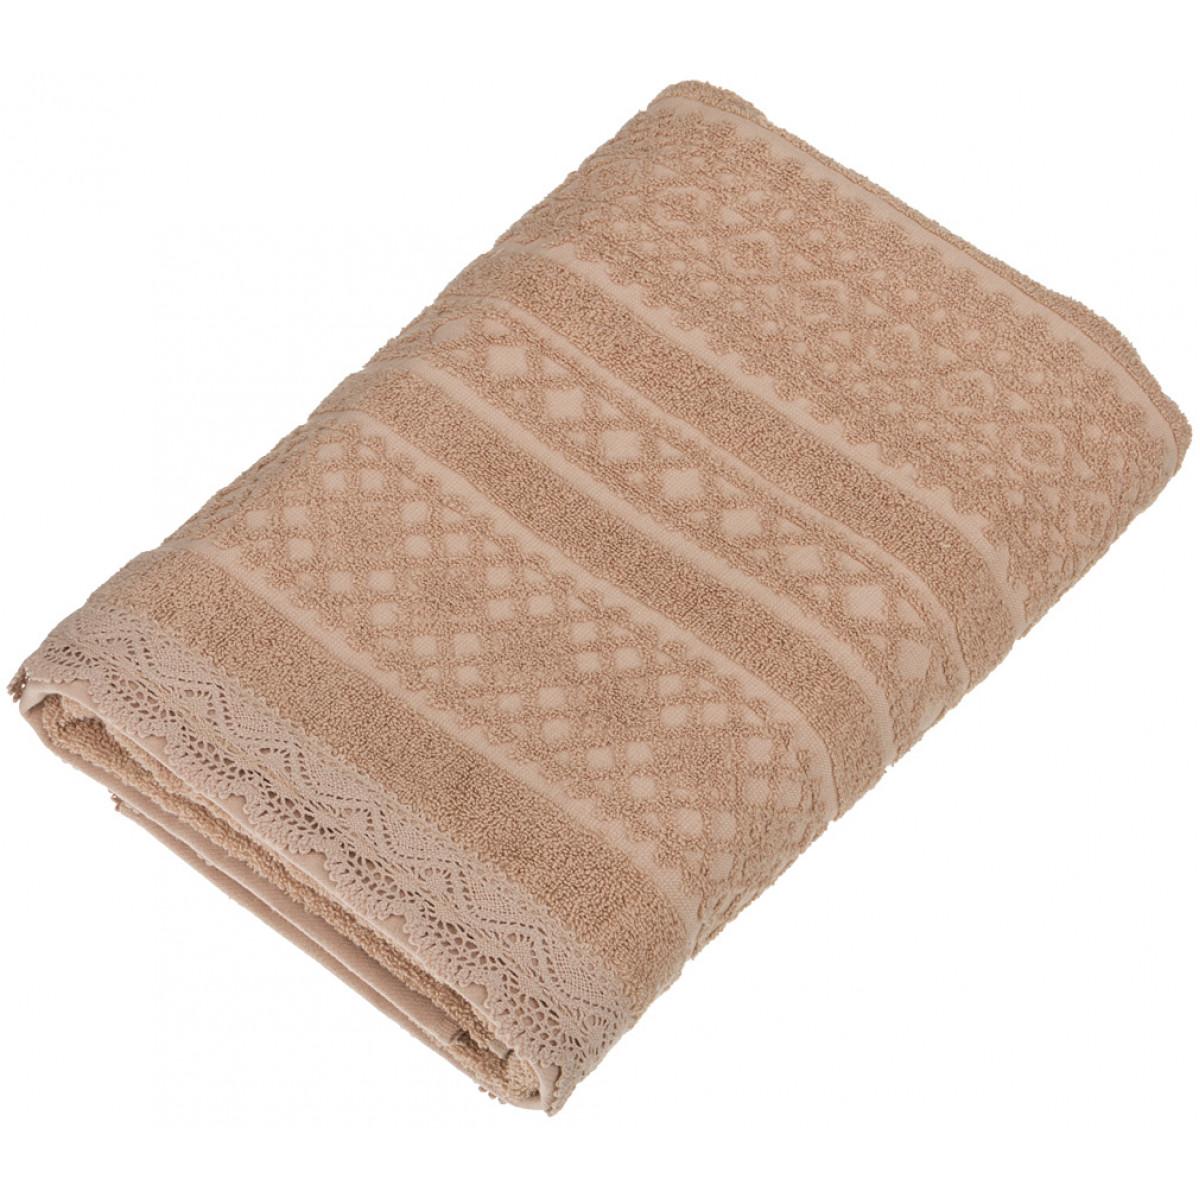 Полотенца Santalino Полотенце Cateline  (50х90 см) полотенце денастия полотенце денастия 50х90 см хлопок